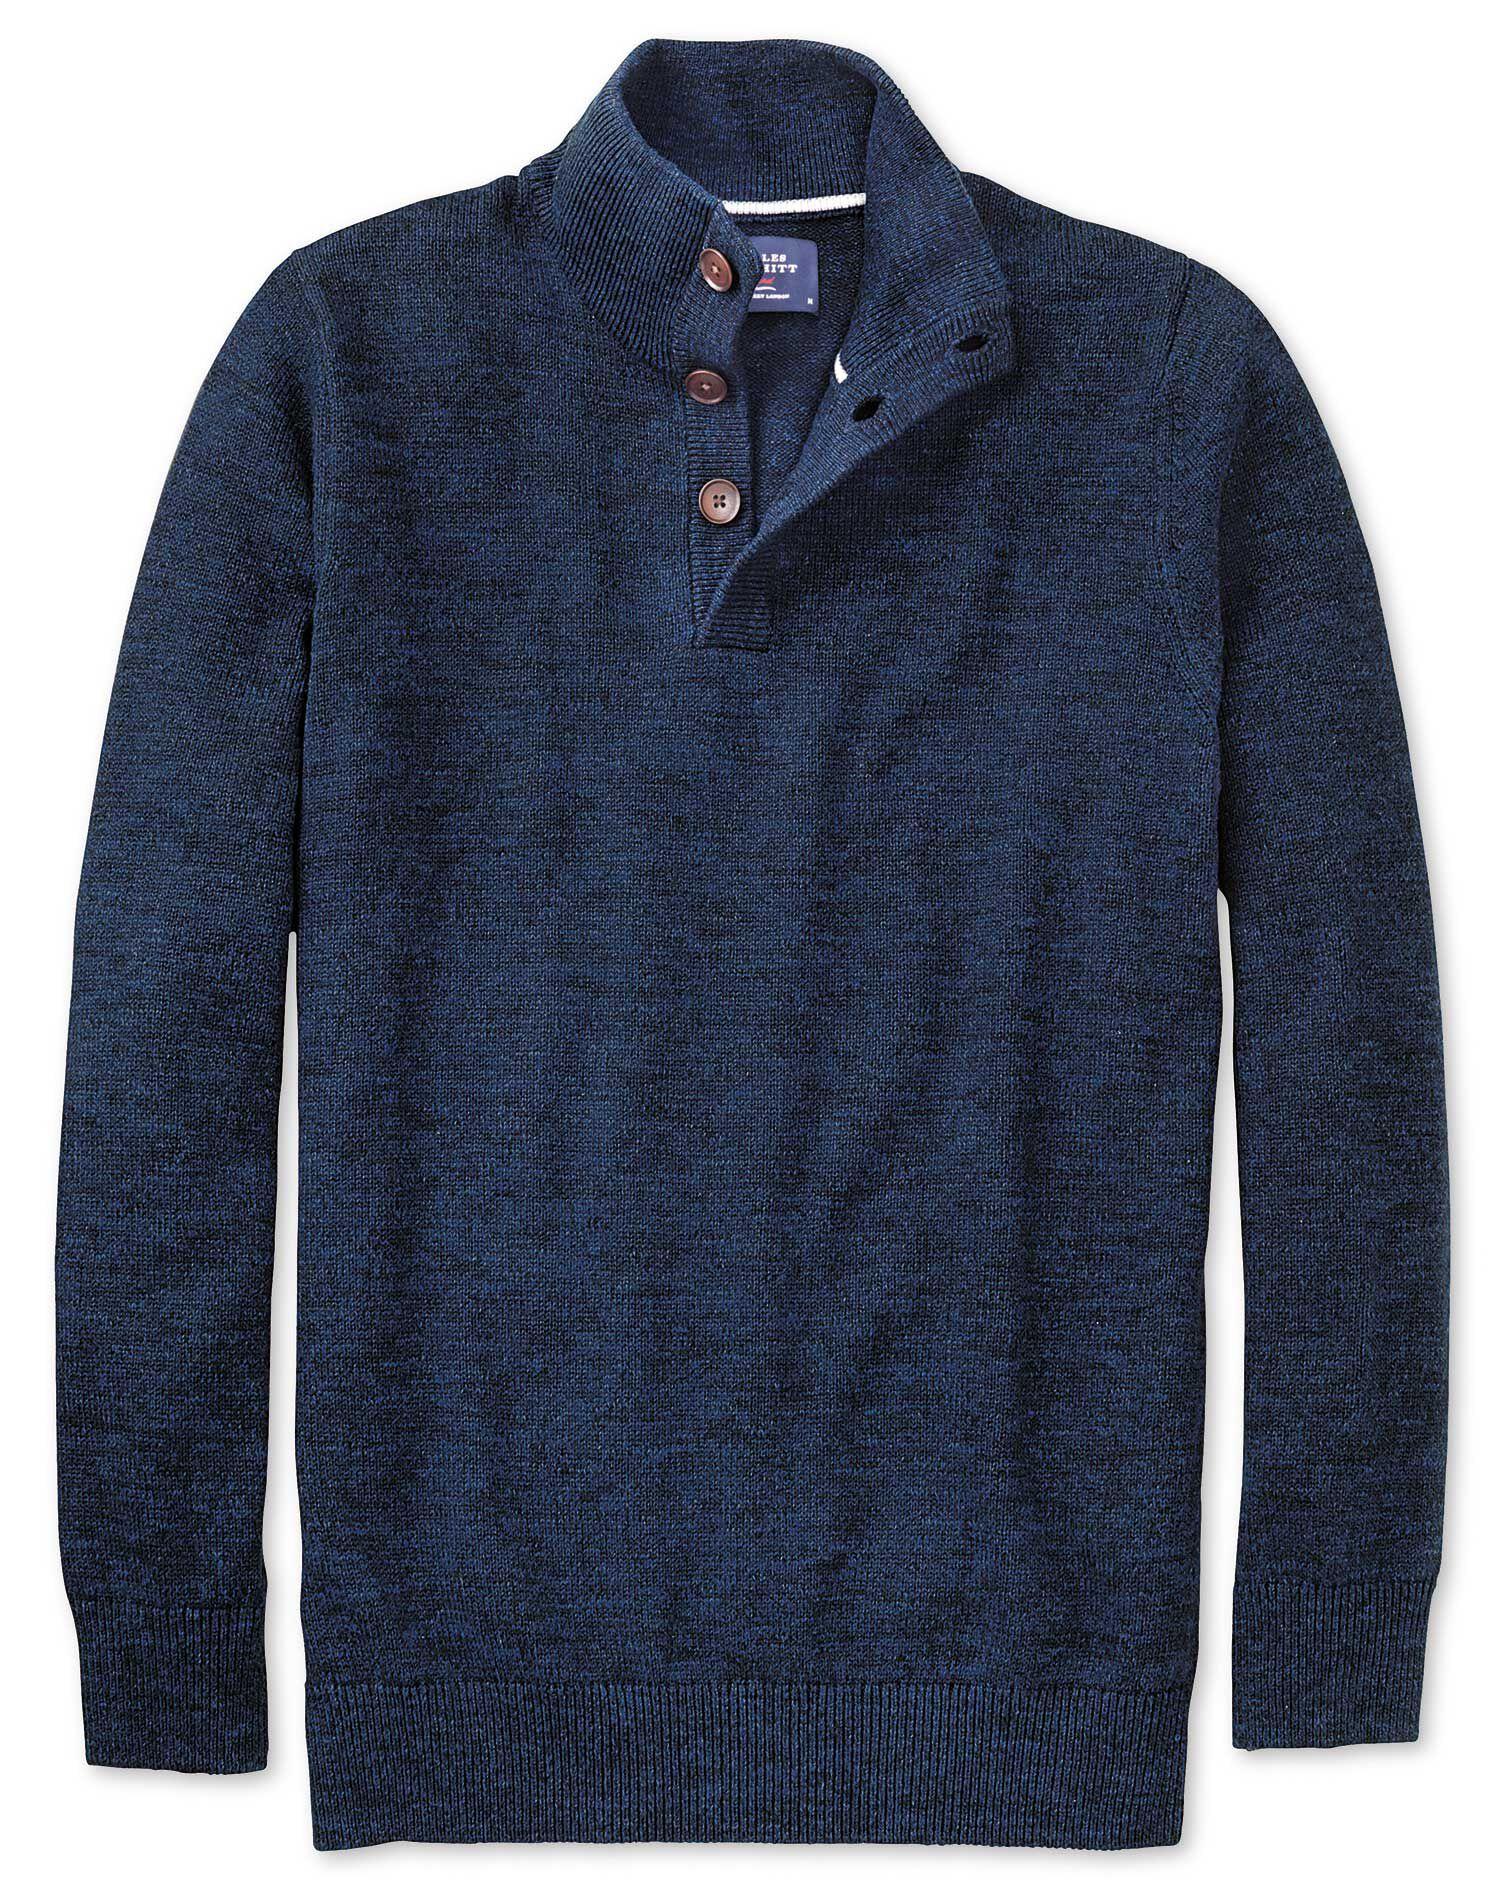 Indigo Blue Heather Button Neck Cotton Jumper Size Small by Charles Tyrwhitt